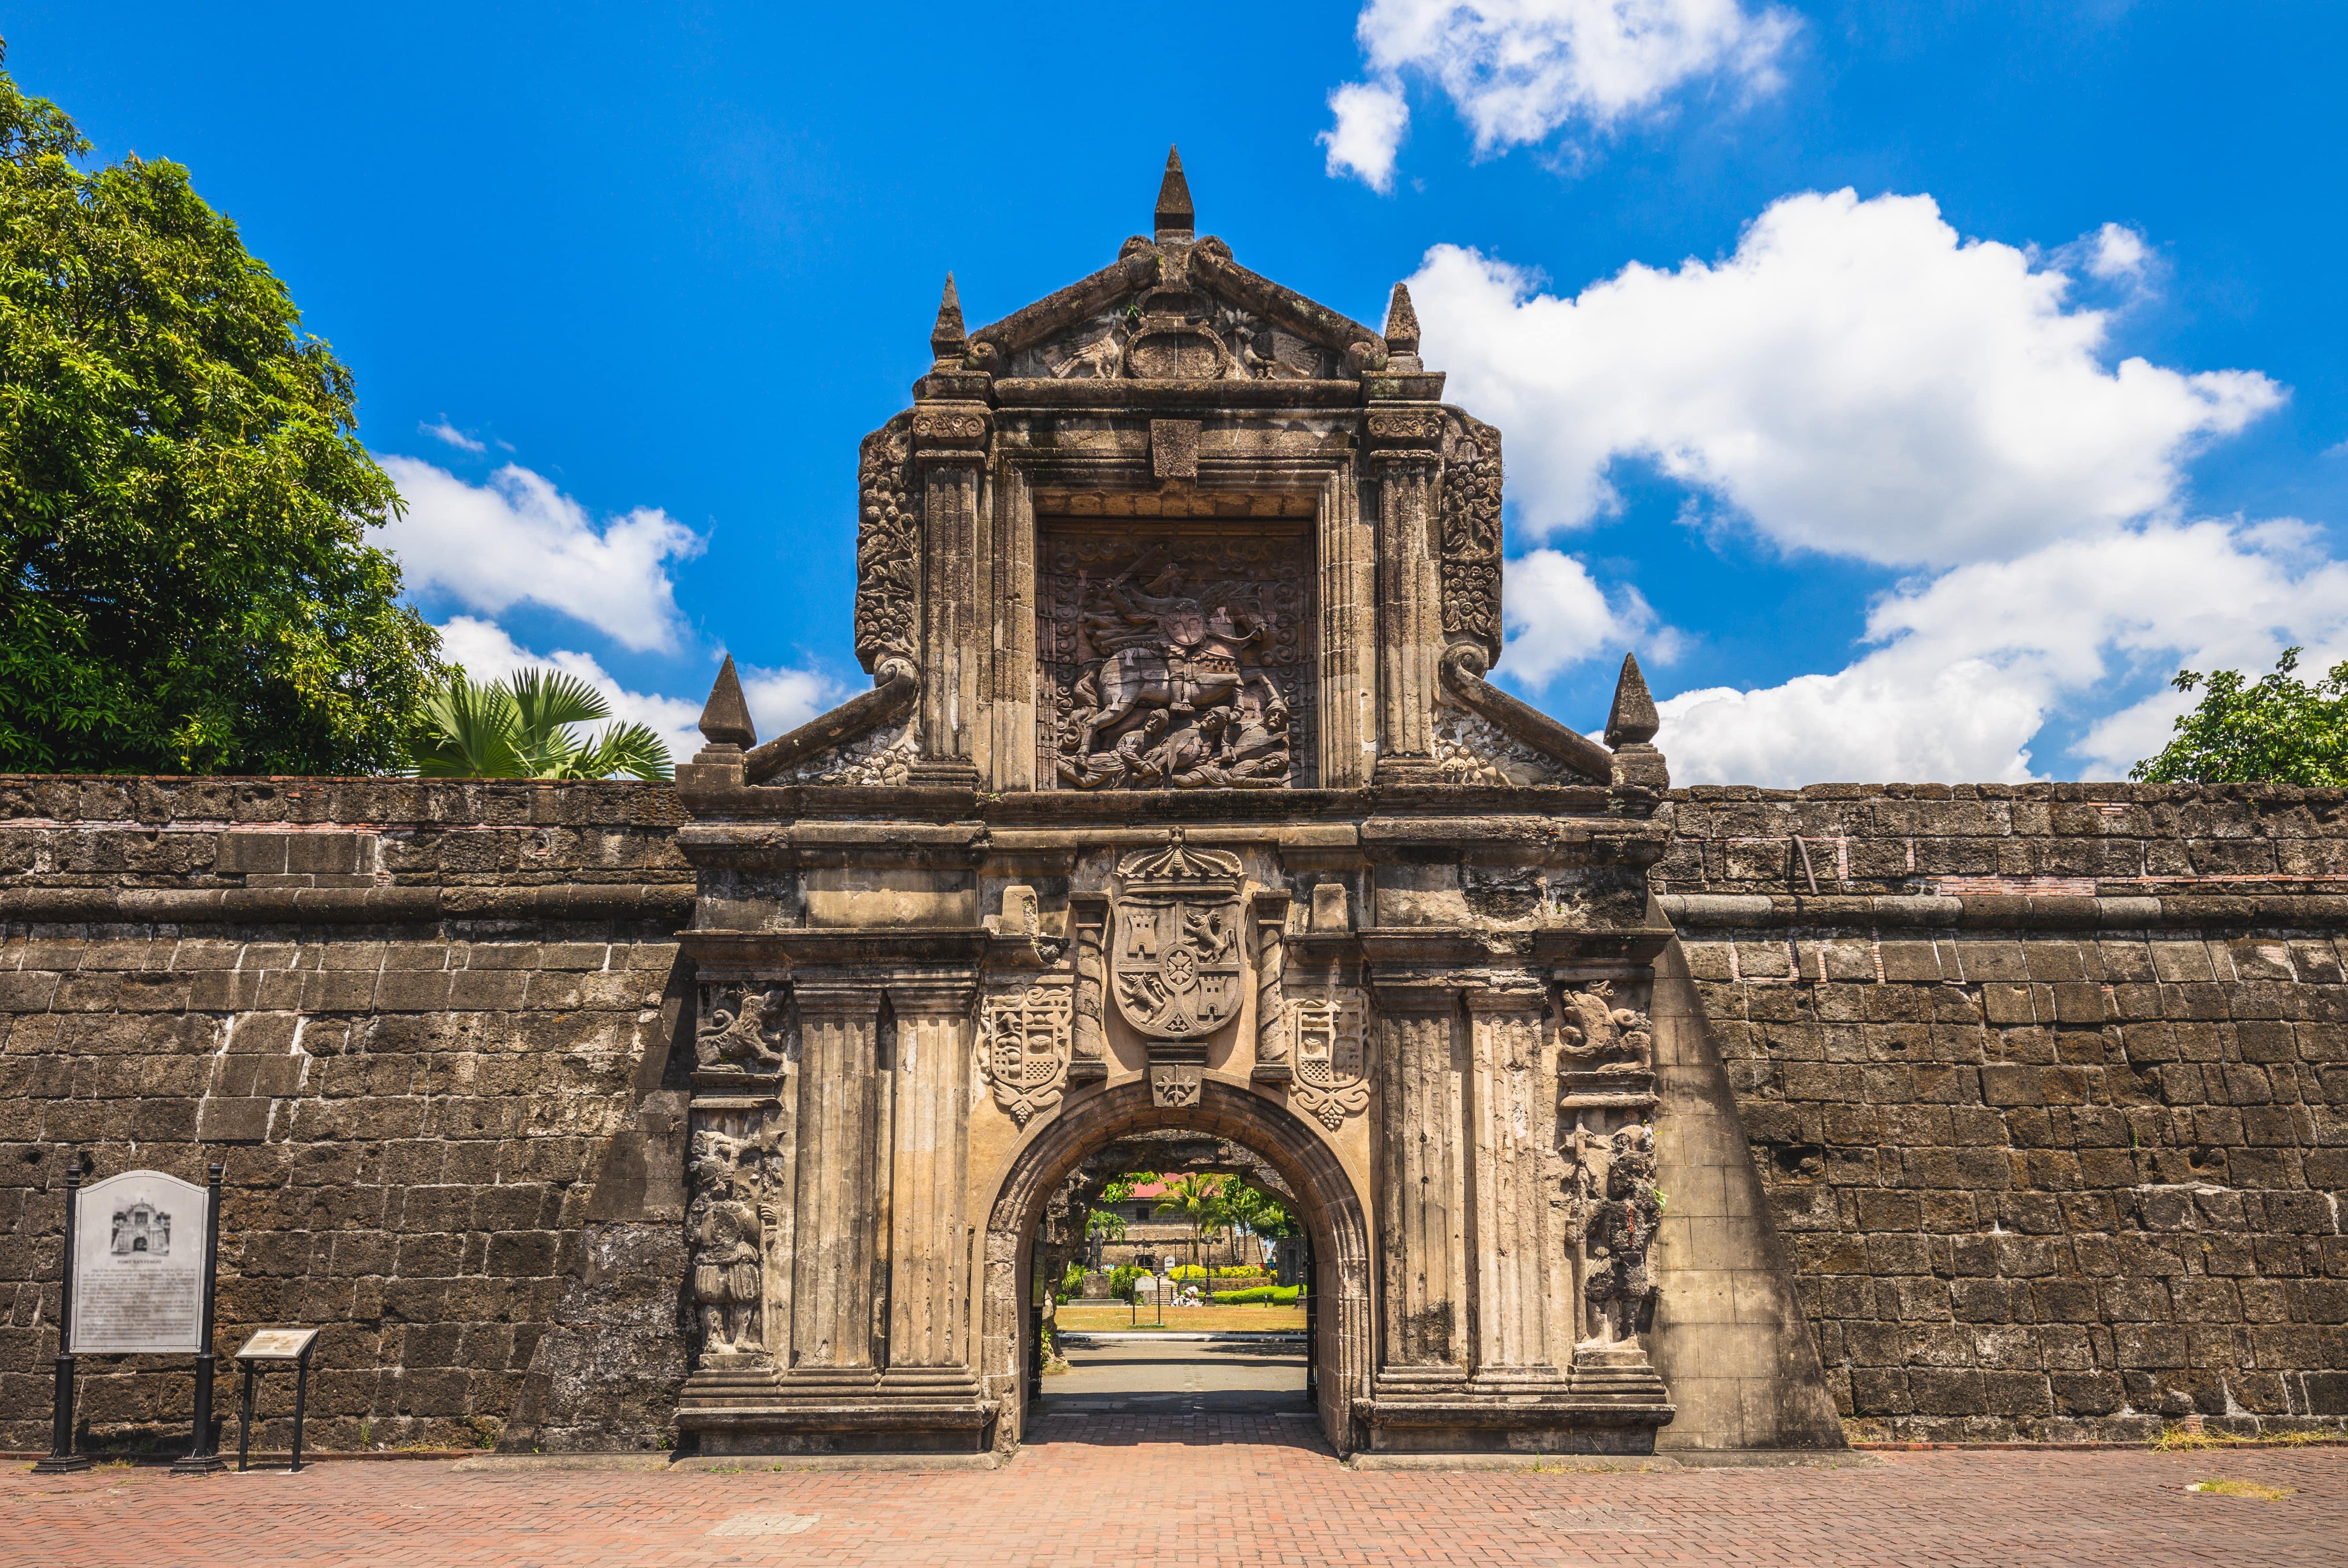 Sunny day in Fort Santiago in Intramuros